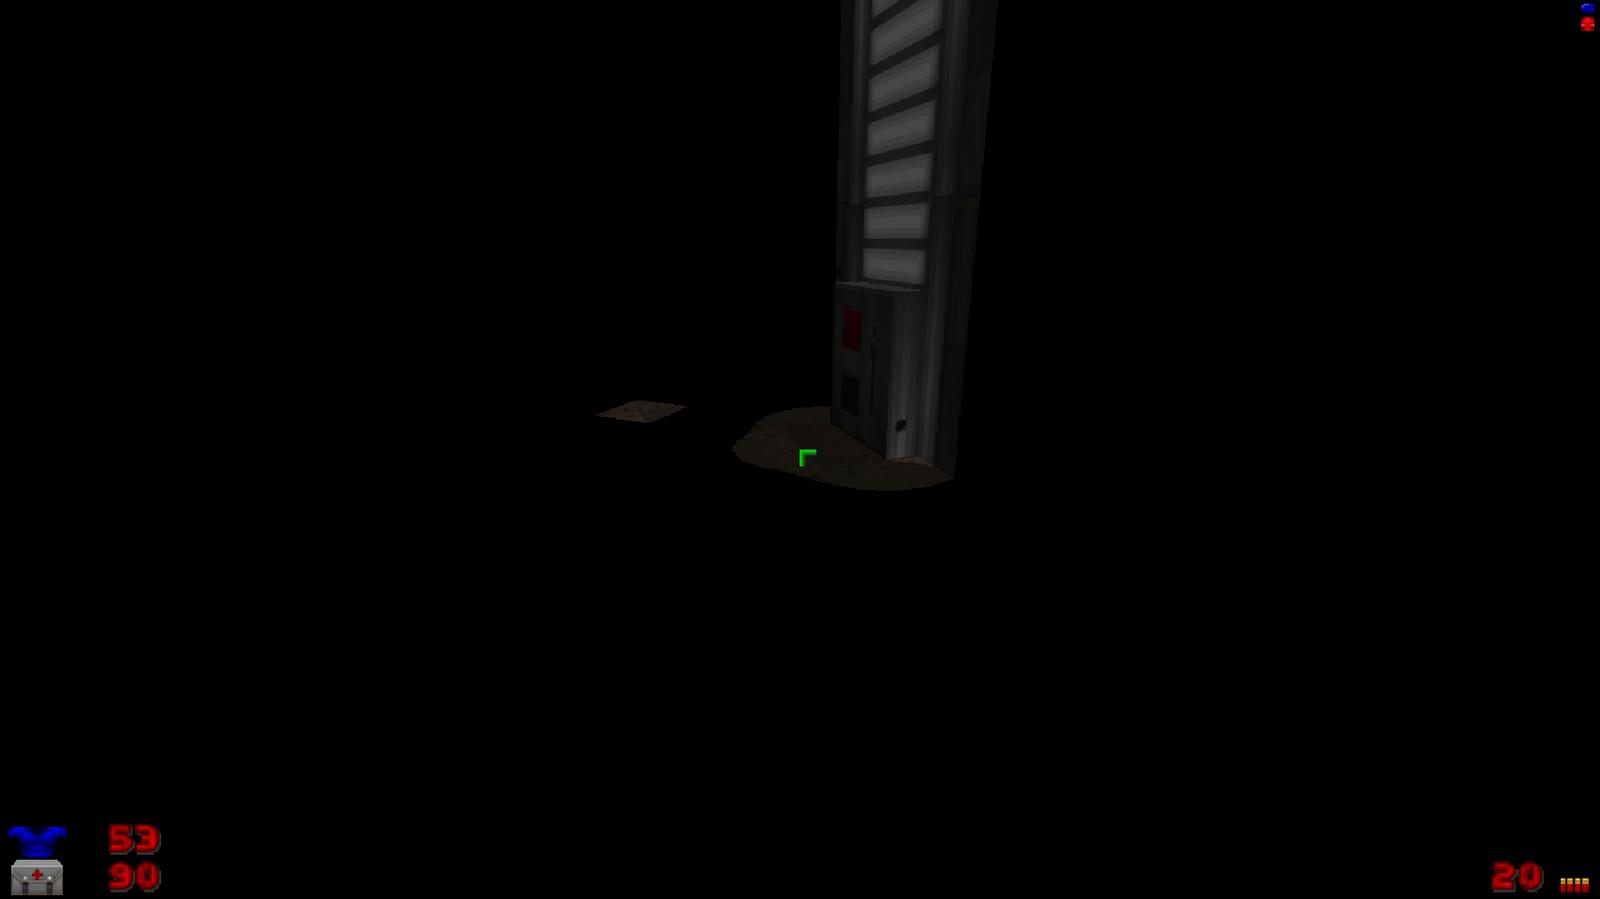 Screenshot_Doom_20180805_145518.png.484bbd079326dbbd94f206eec711ea78.png